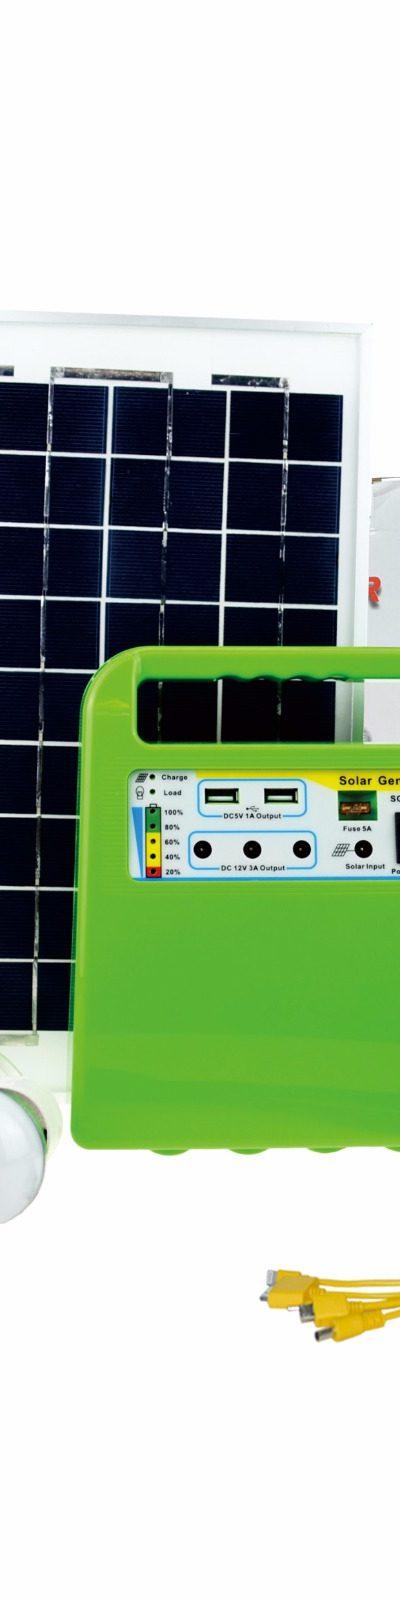 Produk solar panel Jarwinn 24